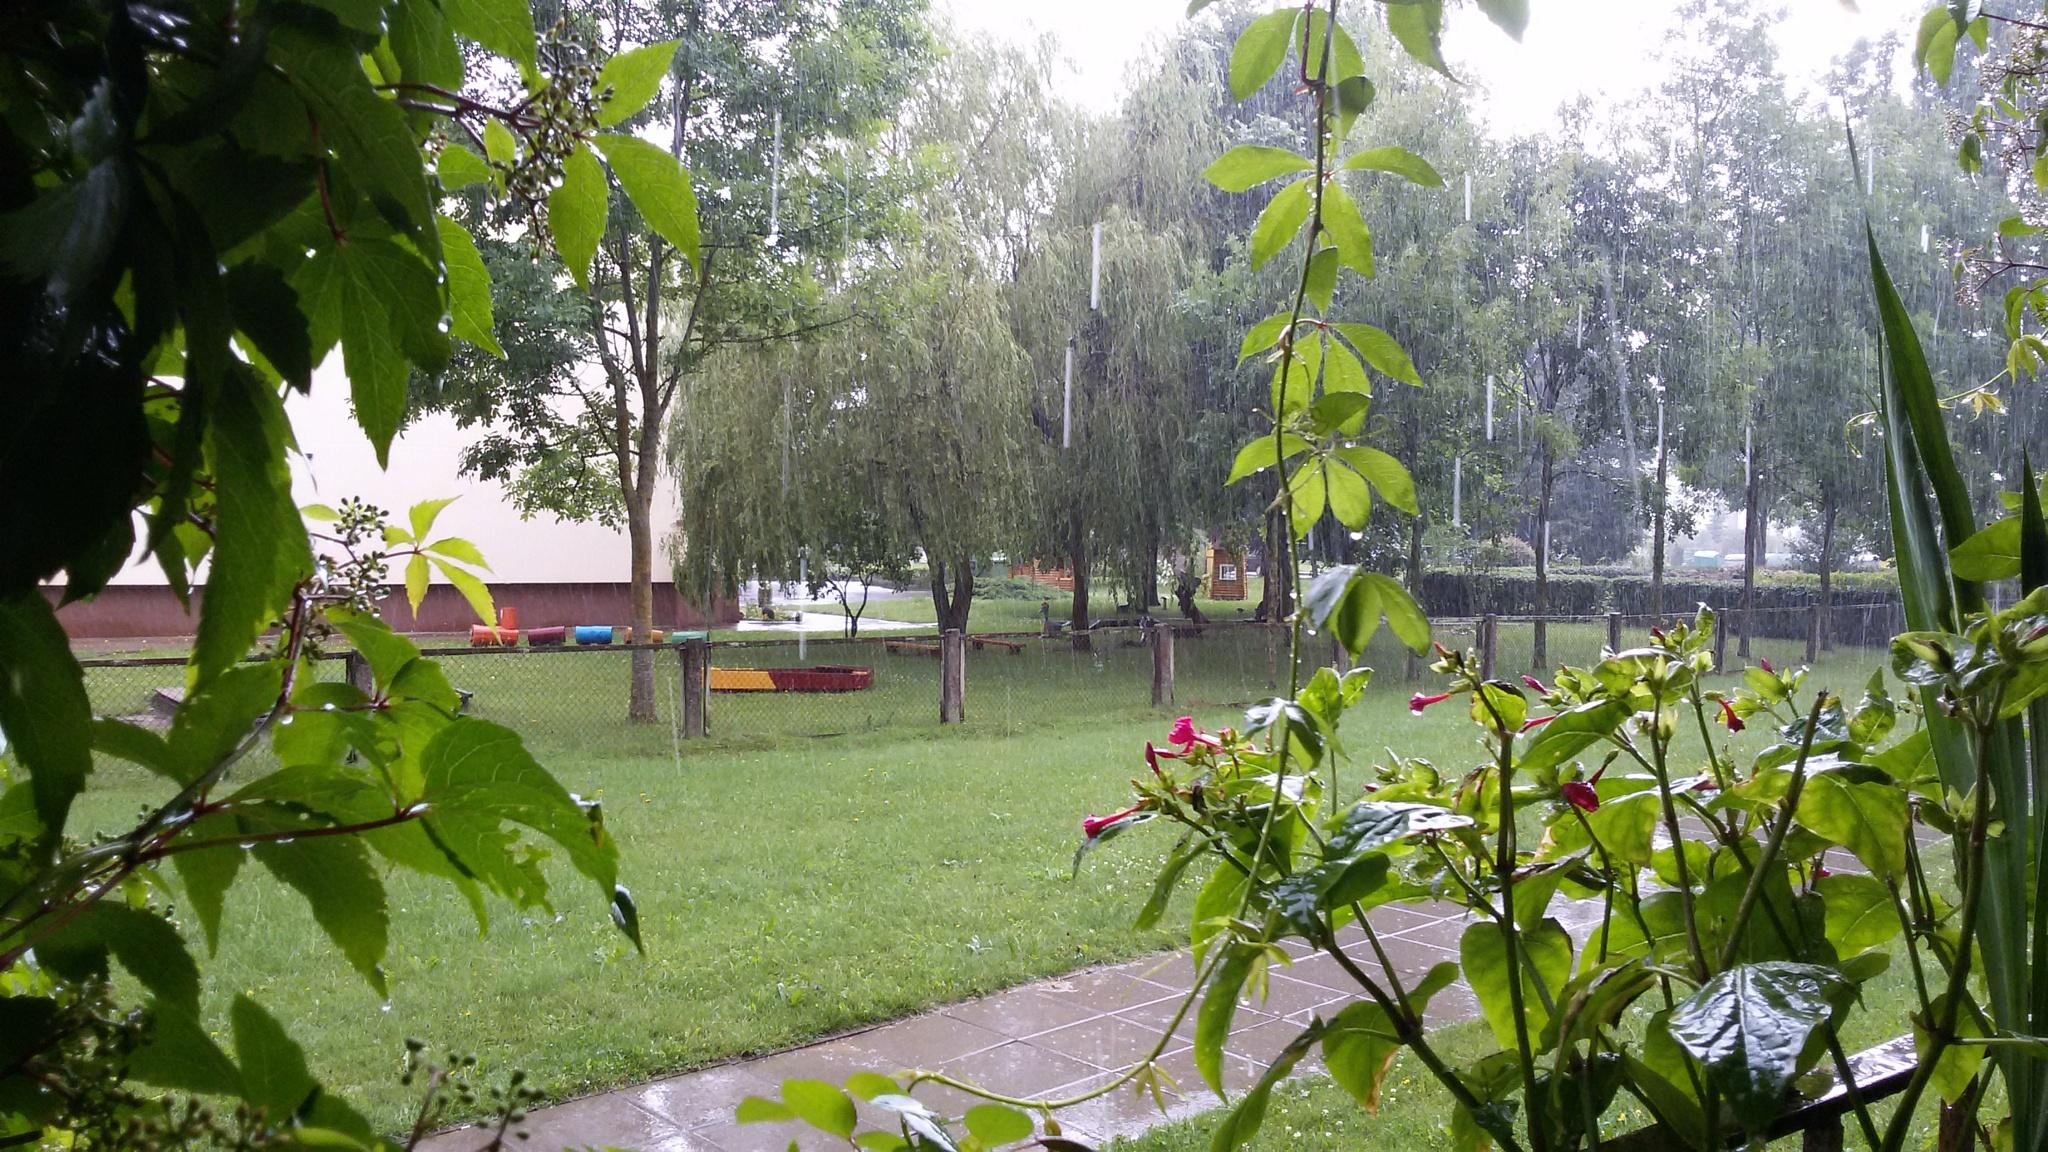 Raining rain by uzkuraitiene62